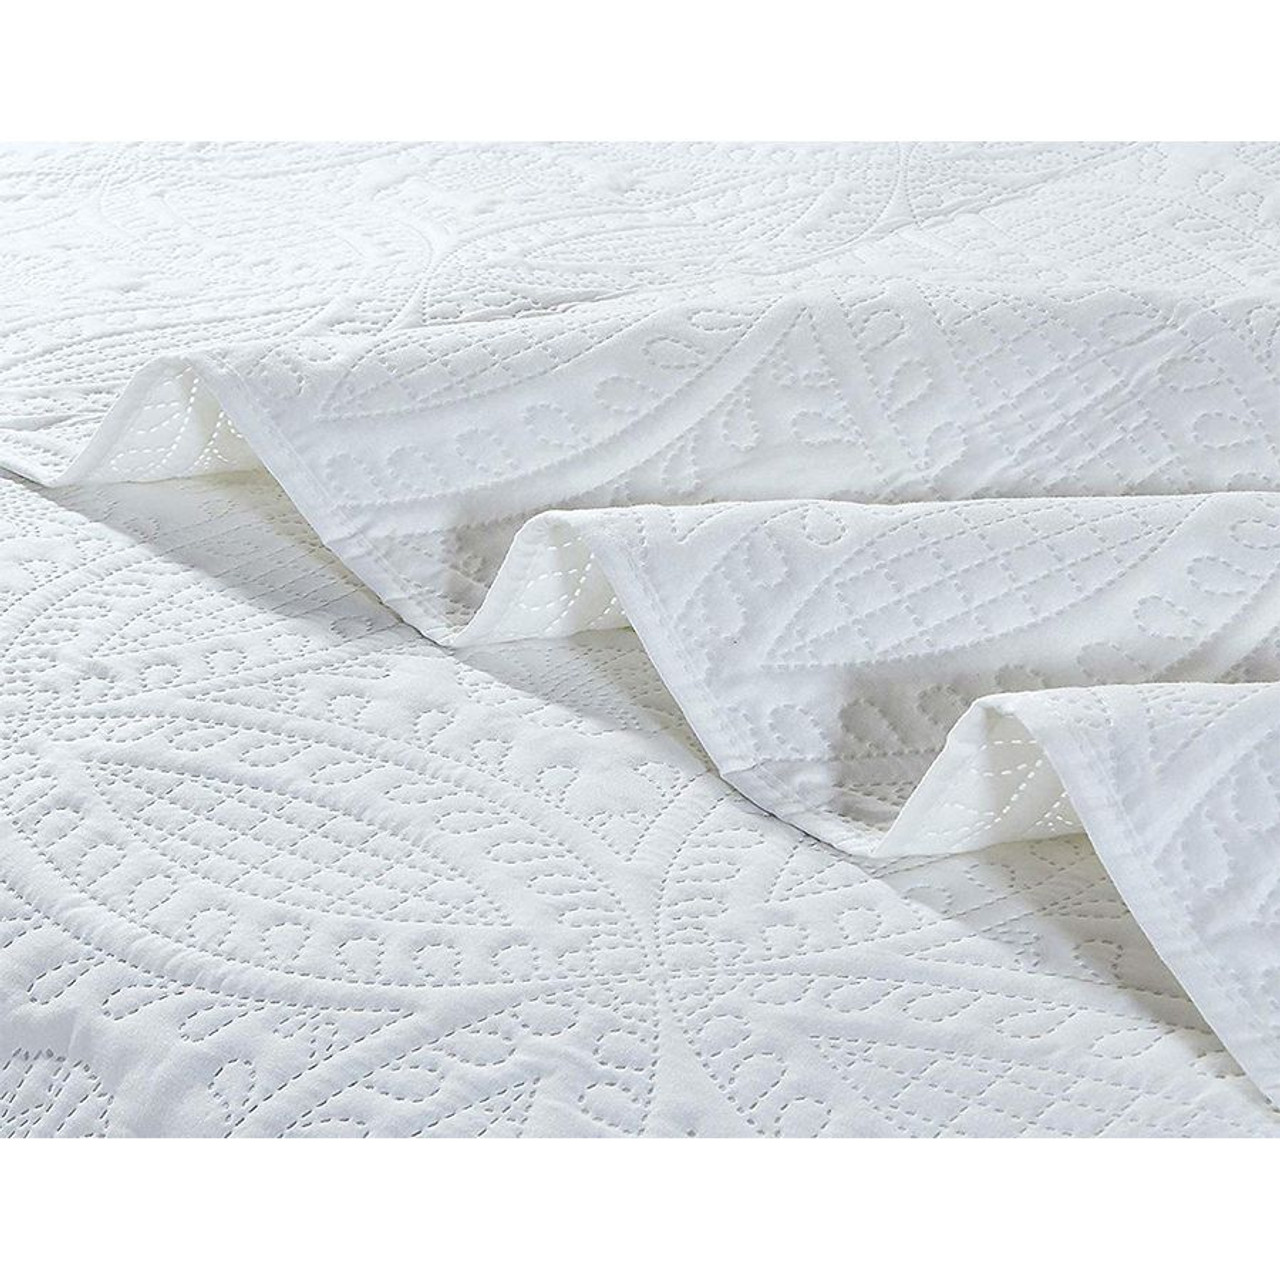 3 Pc Oversized Bedspread Coverlet Set White Color in USA, California, New York, NY City, Los Angeles, San Francisco, Pennsylvania, Washington DC, Virginia and Maryland